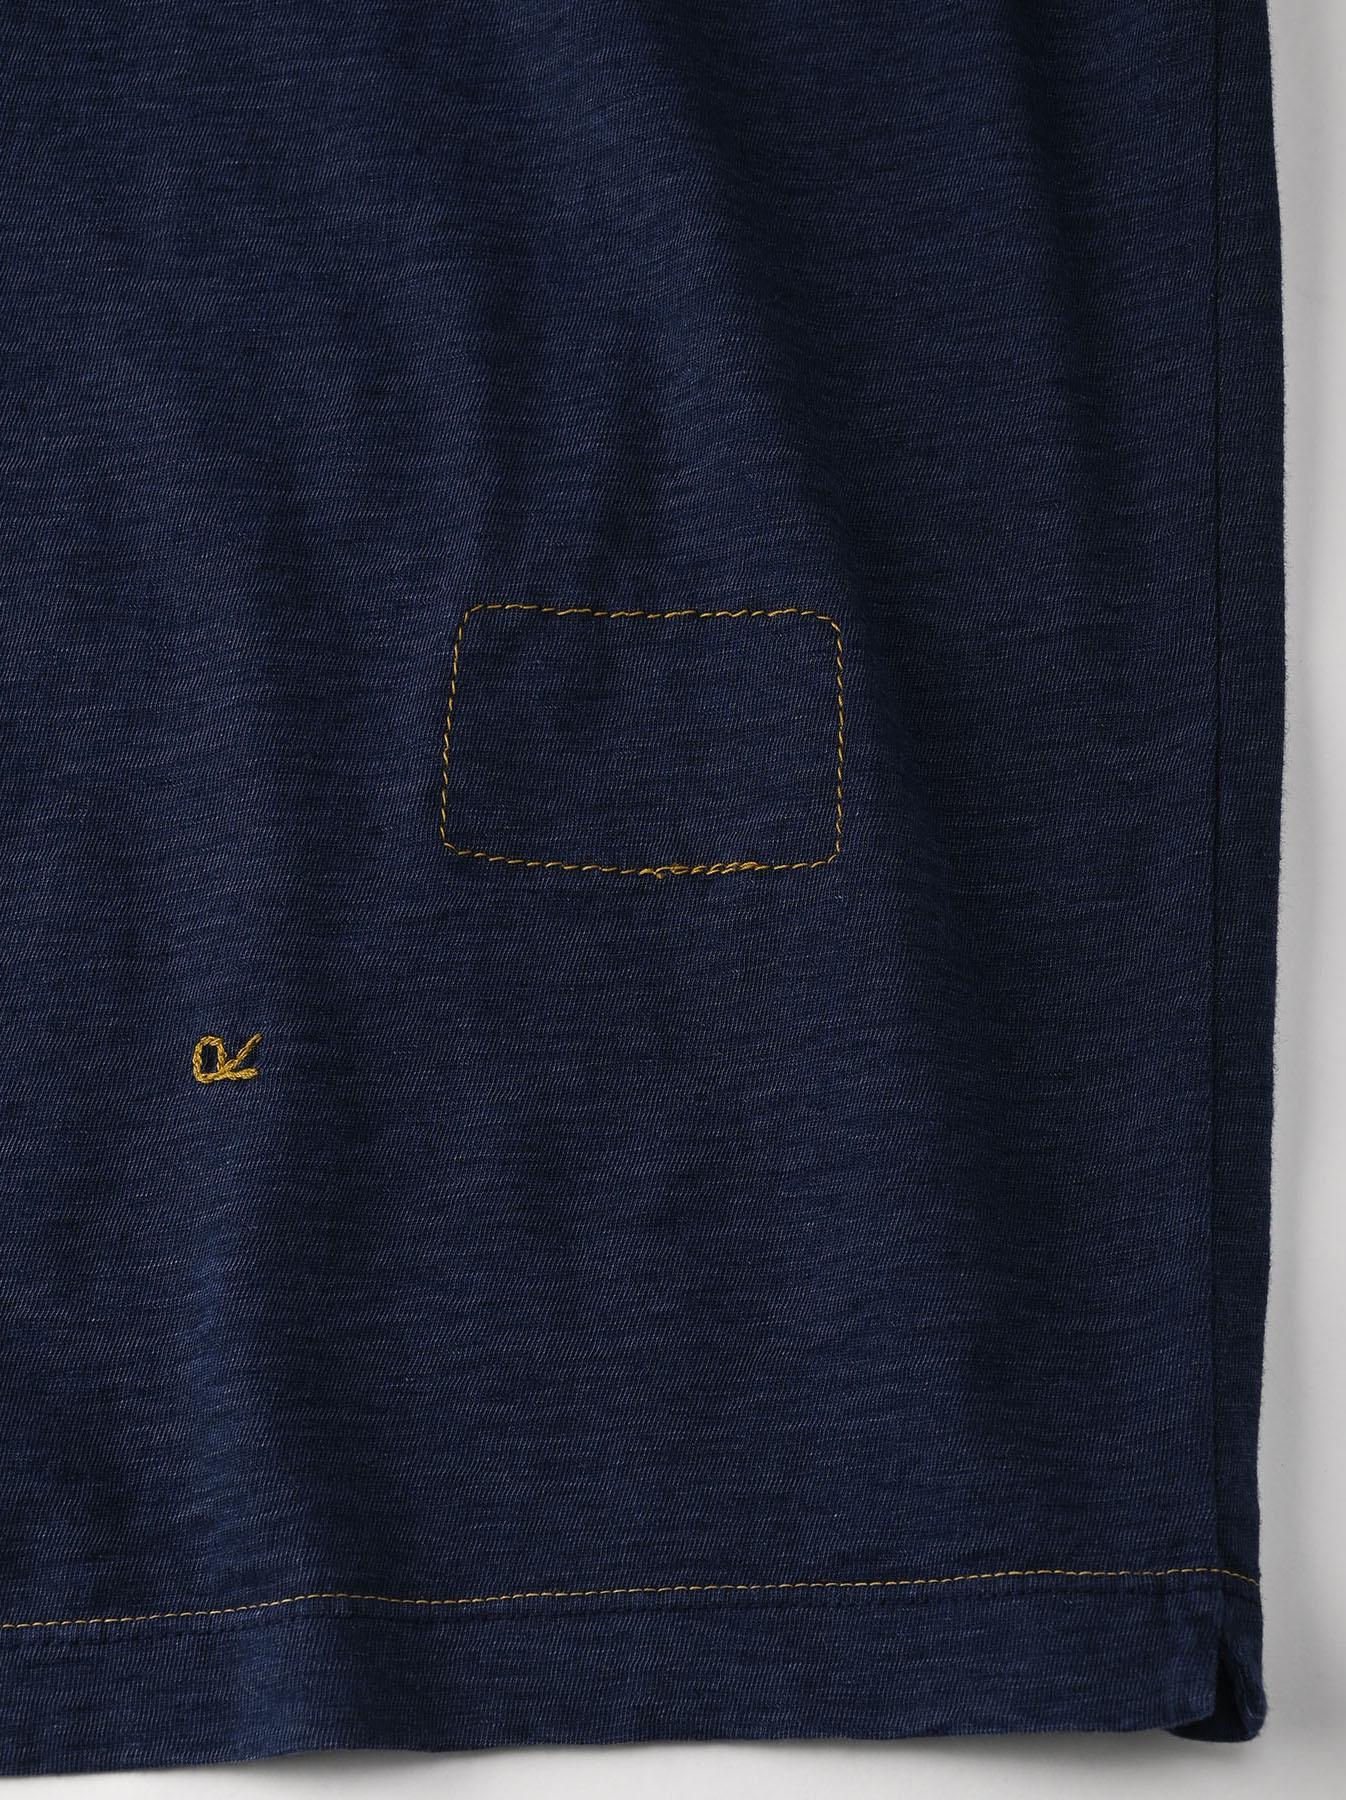 Indigo Hayama-kun Embroidered 908 Ocean T-shirt (0621)-11